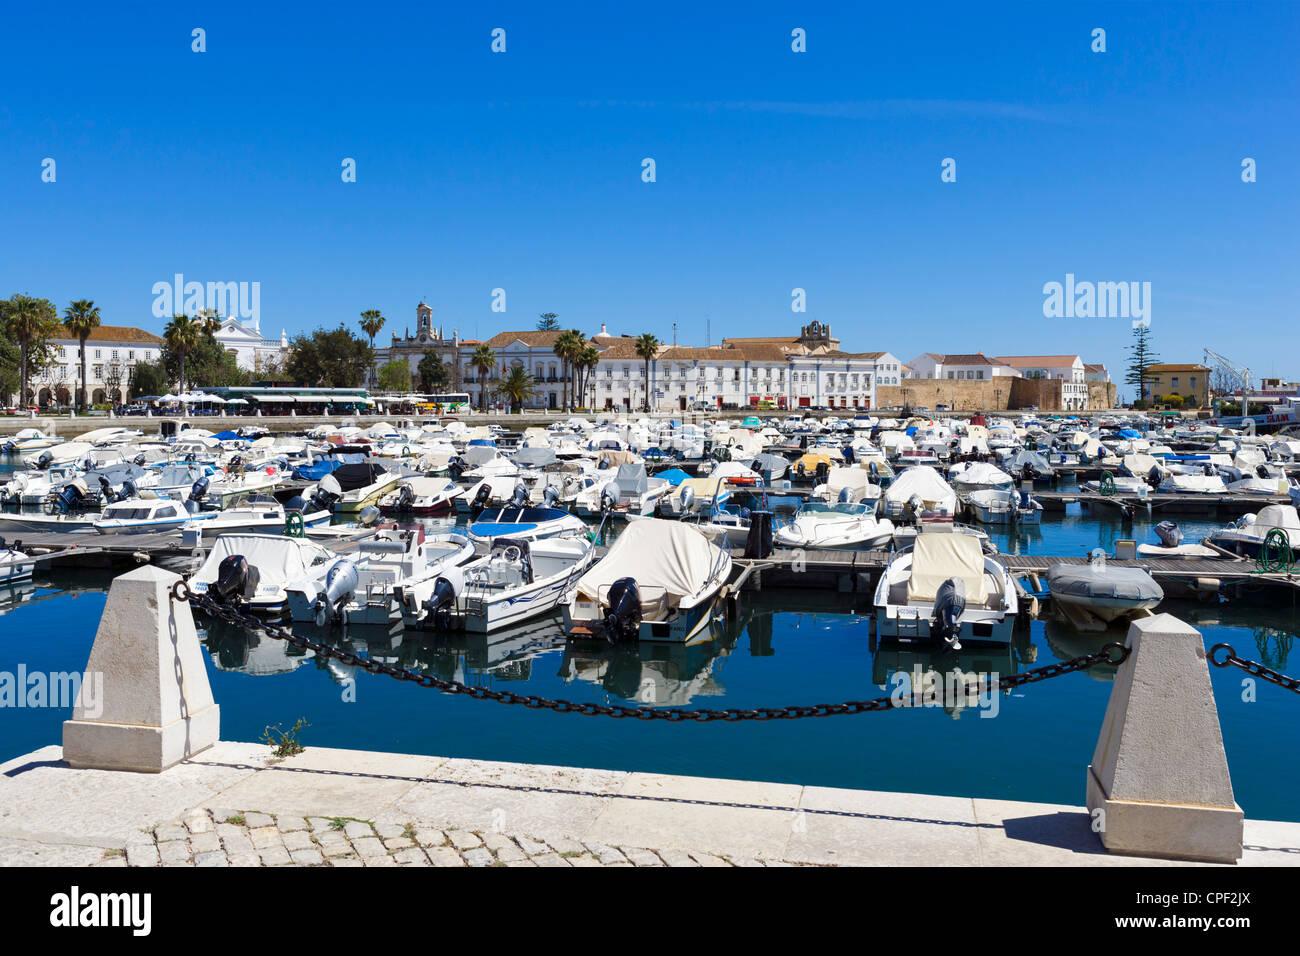 Marina looking towards the old town (Cidade Velha or Vila Adentro), Faro, Algarve, Portugal - Stock Image